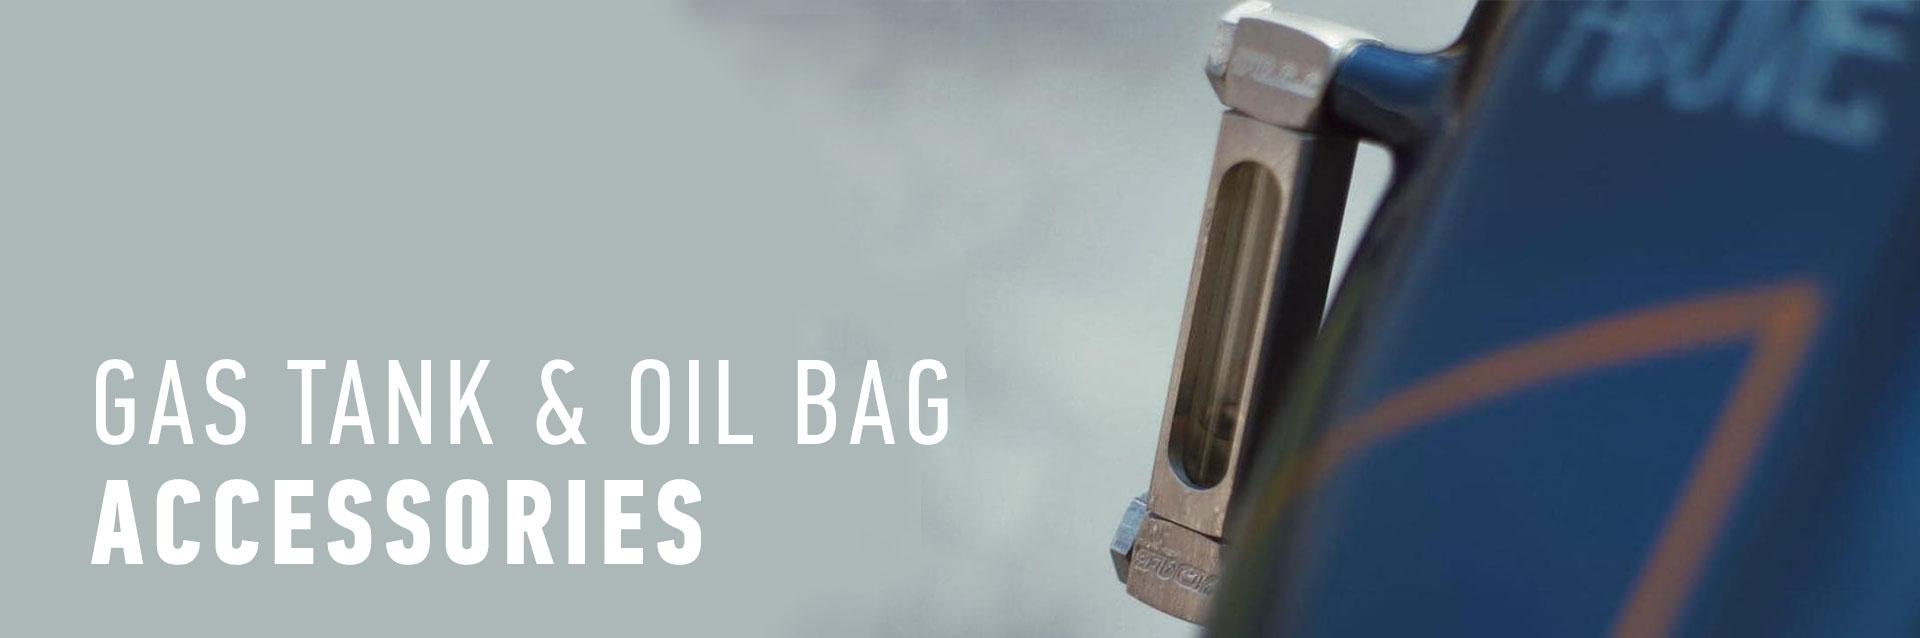 bpd-categories-gas-tank-oil-bag-accessories-2.jpg